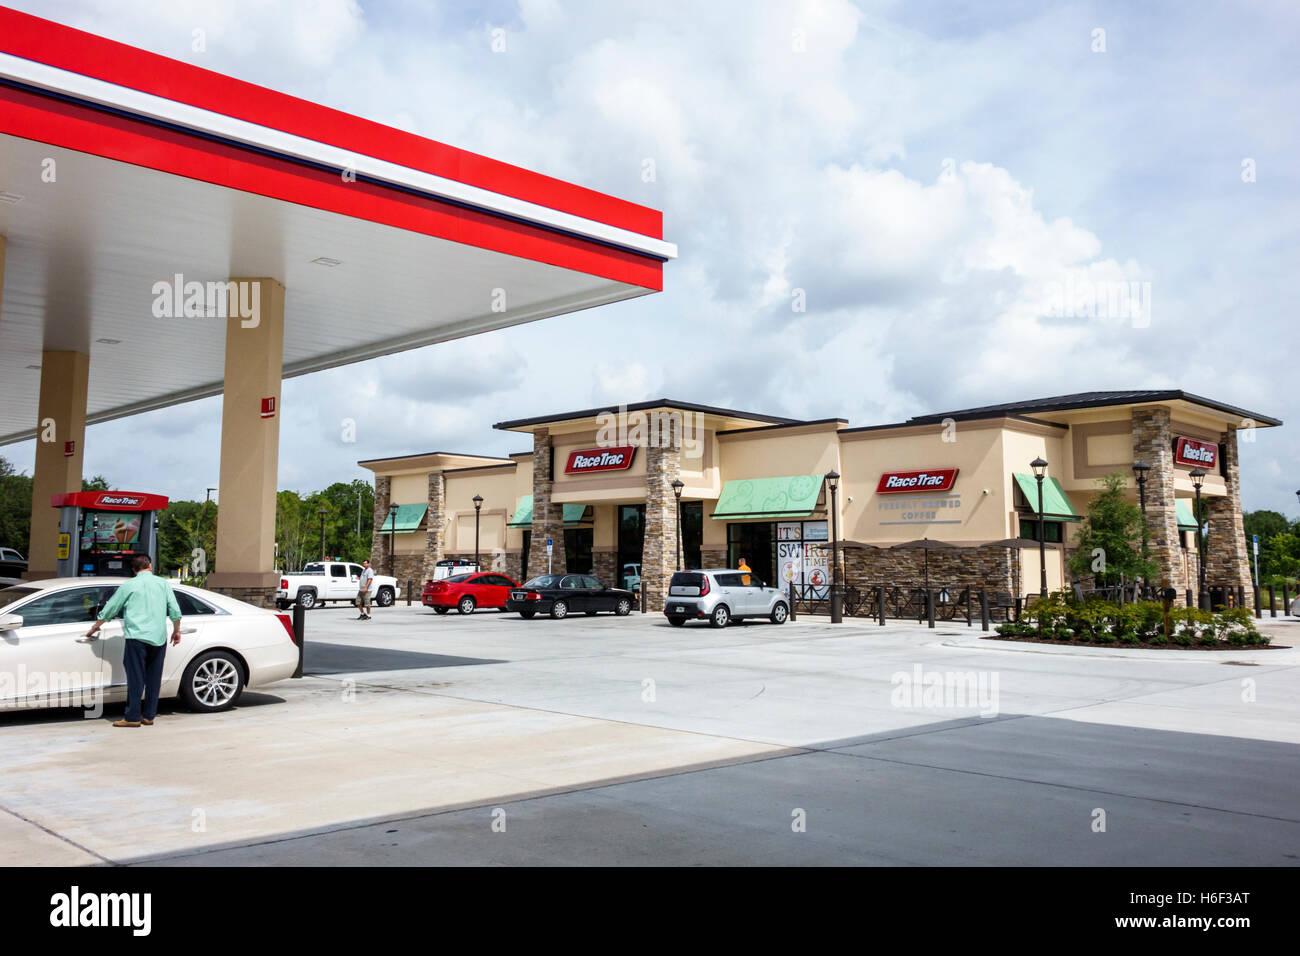 Port St. Lucie Florida Saint Race Trac Gas Tankstelle Benzin Convenience-store Stockbild